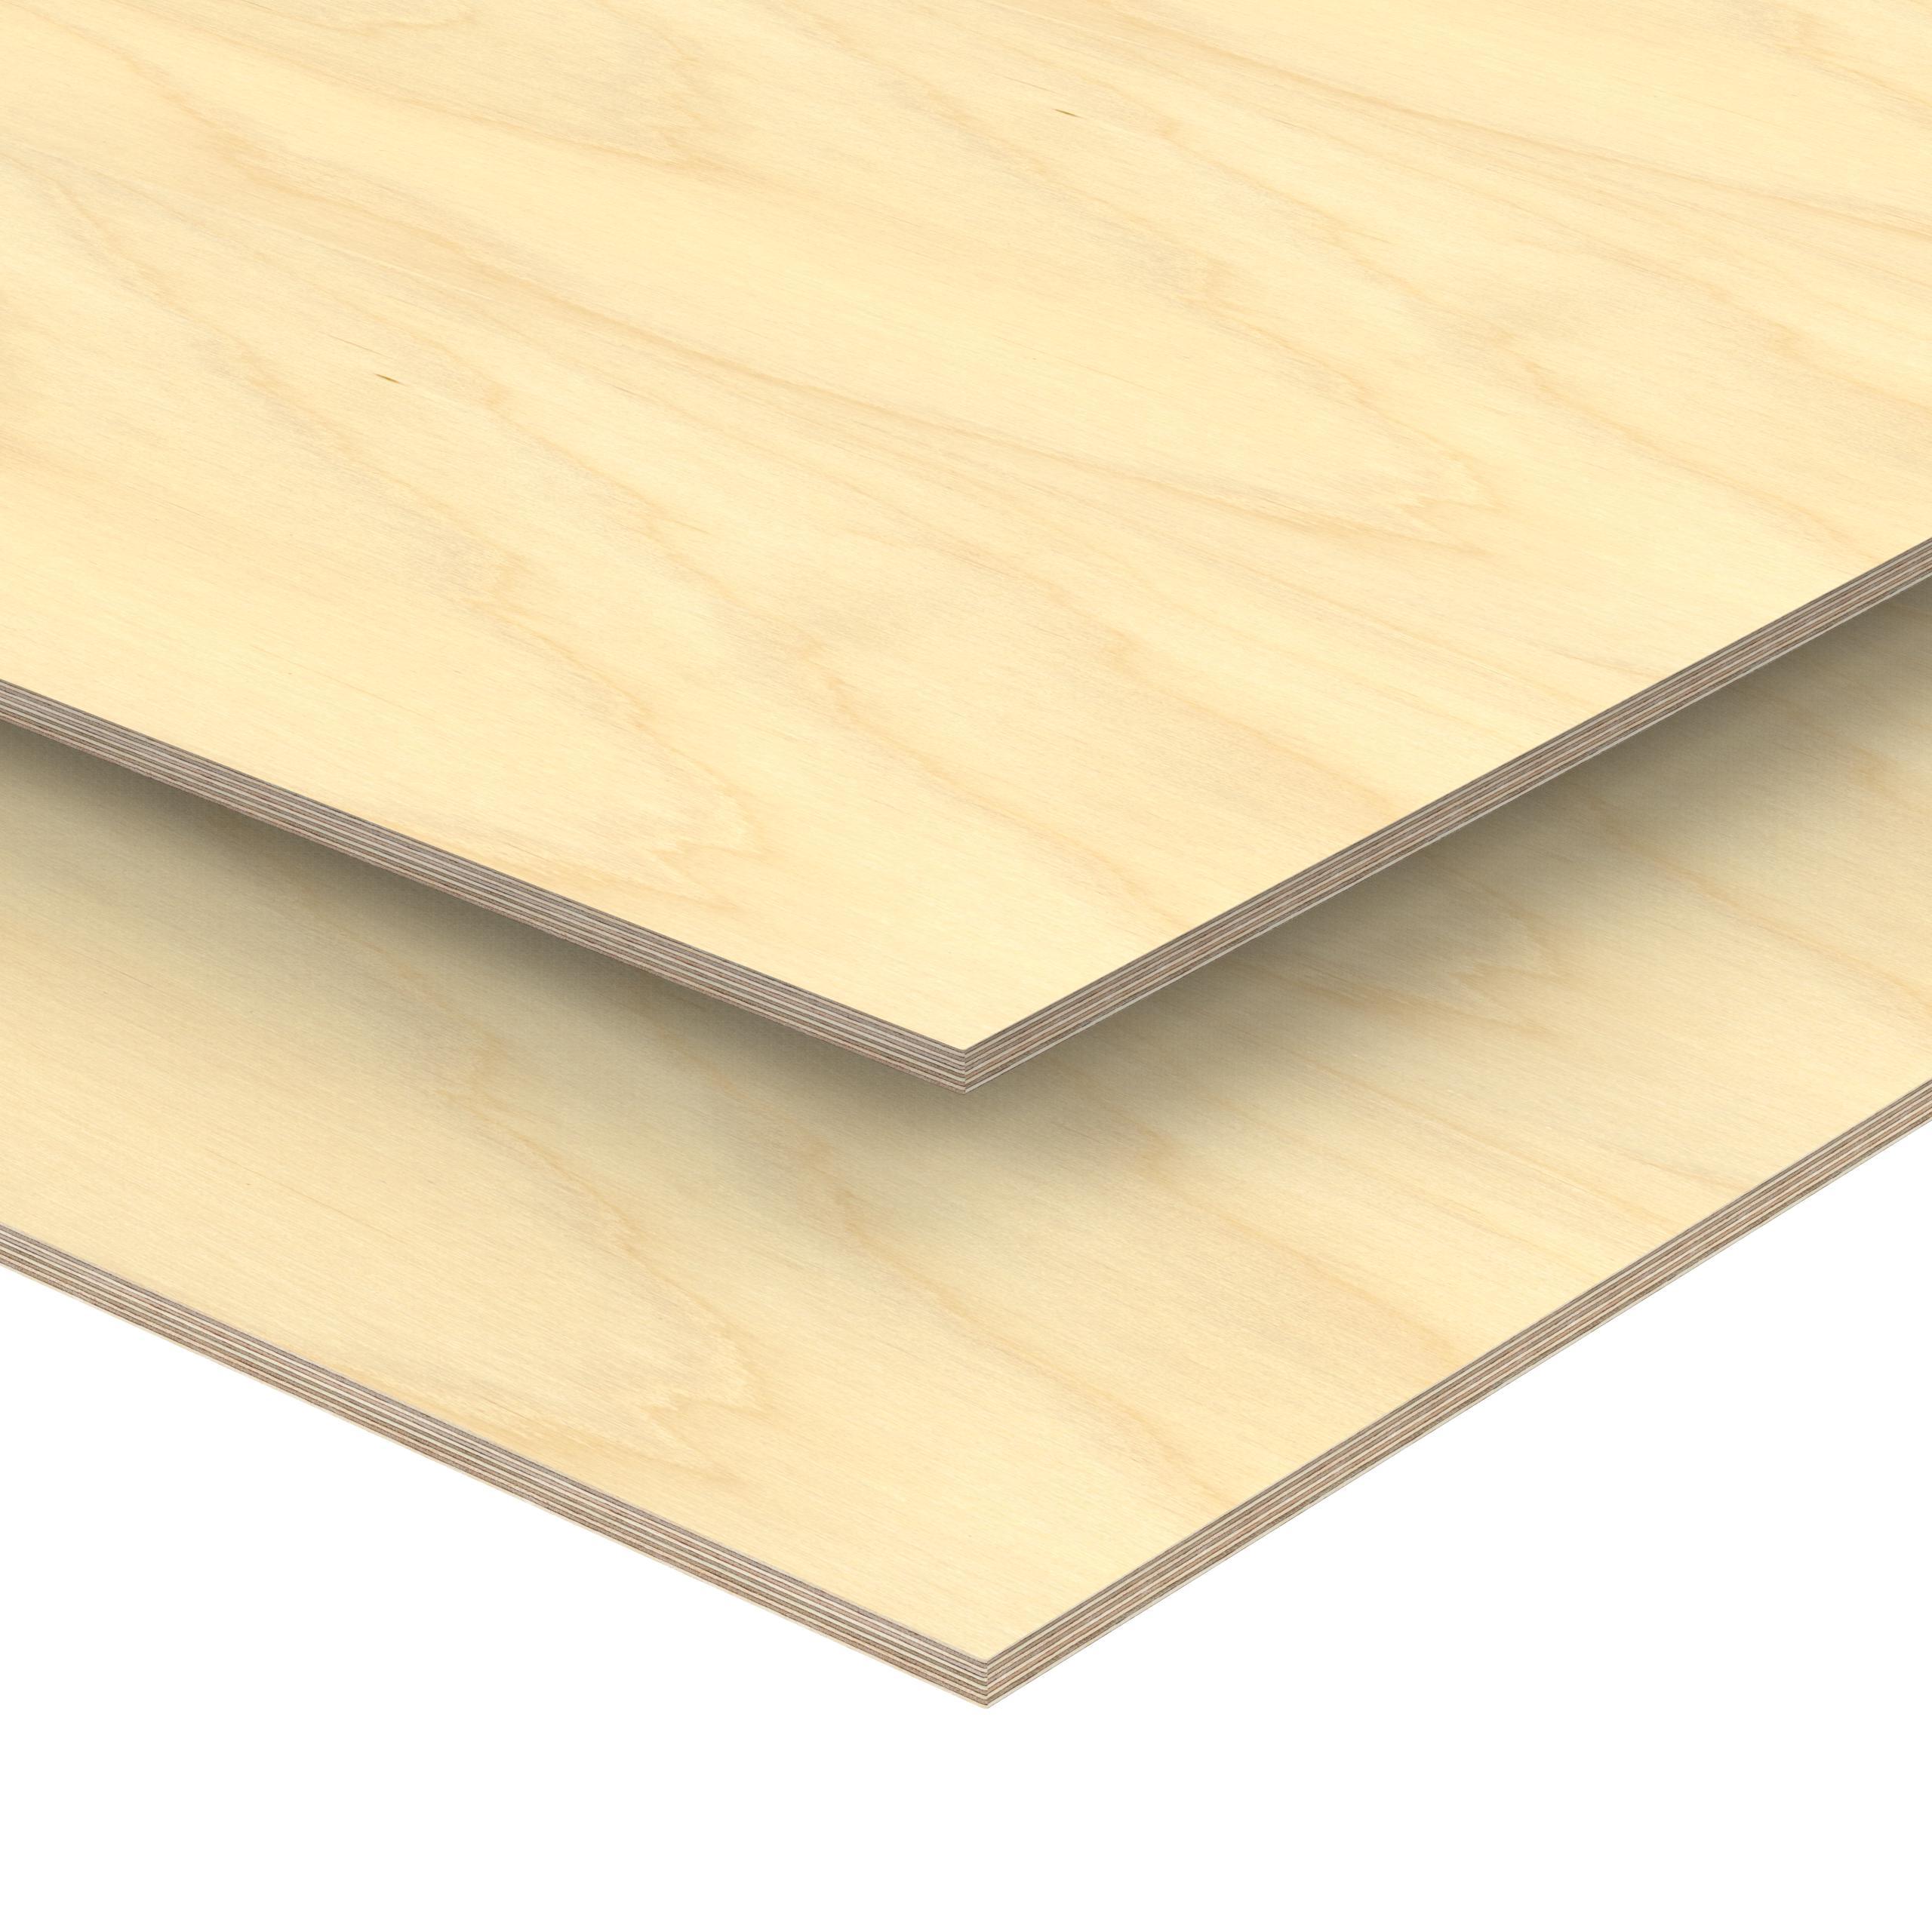 20x20 cm 24mm Multiplex Zuschnitt L/änge bis 200cm Multiplexplatten Zuschnitte Auswahl